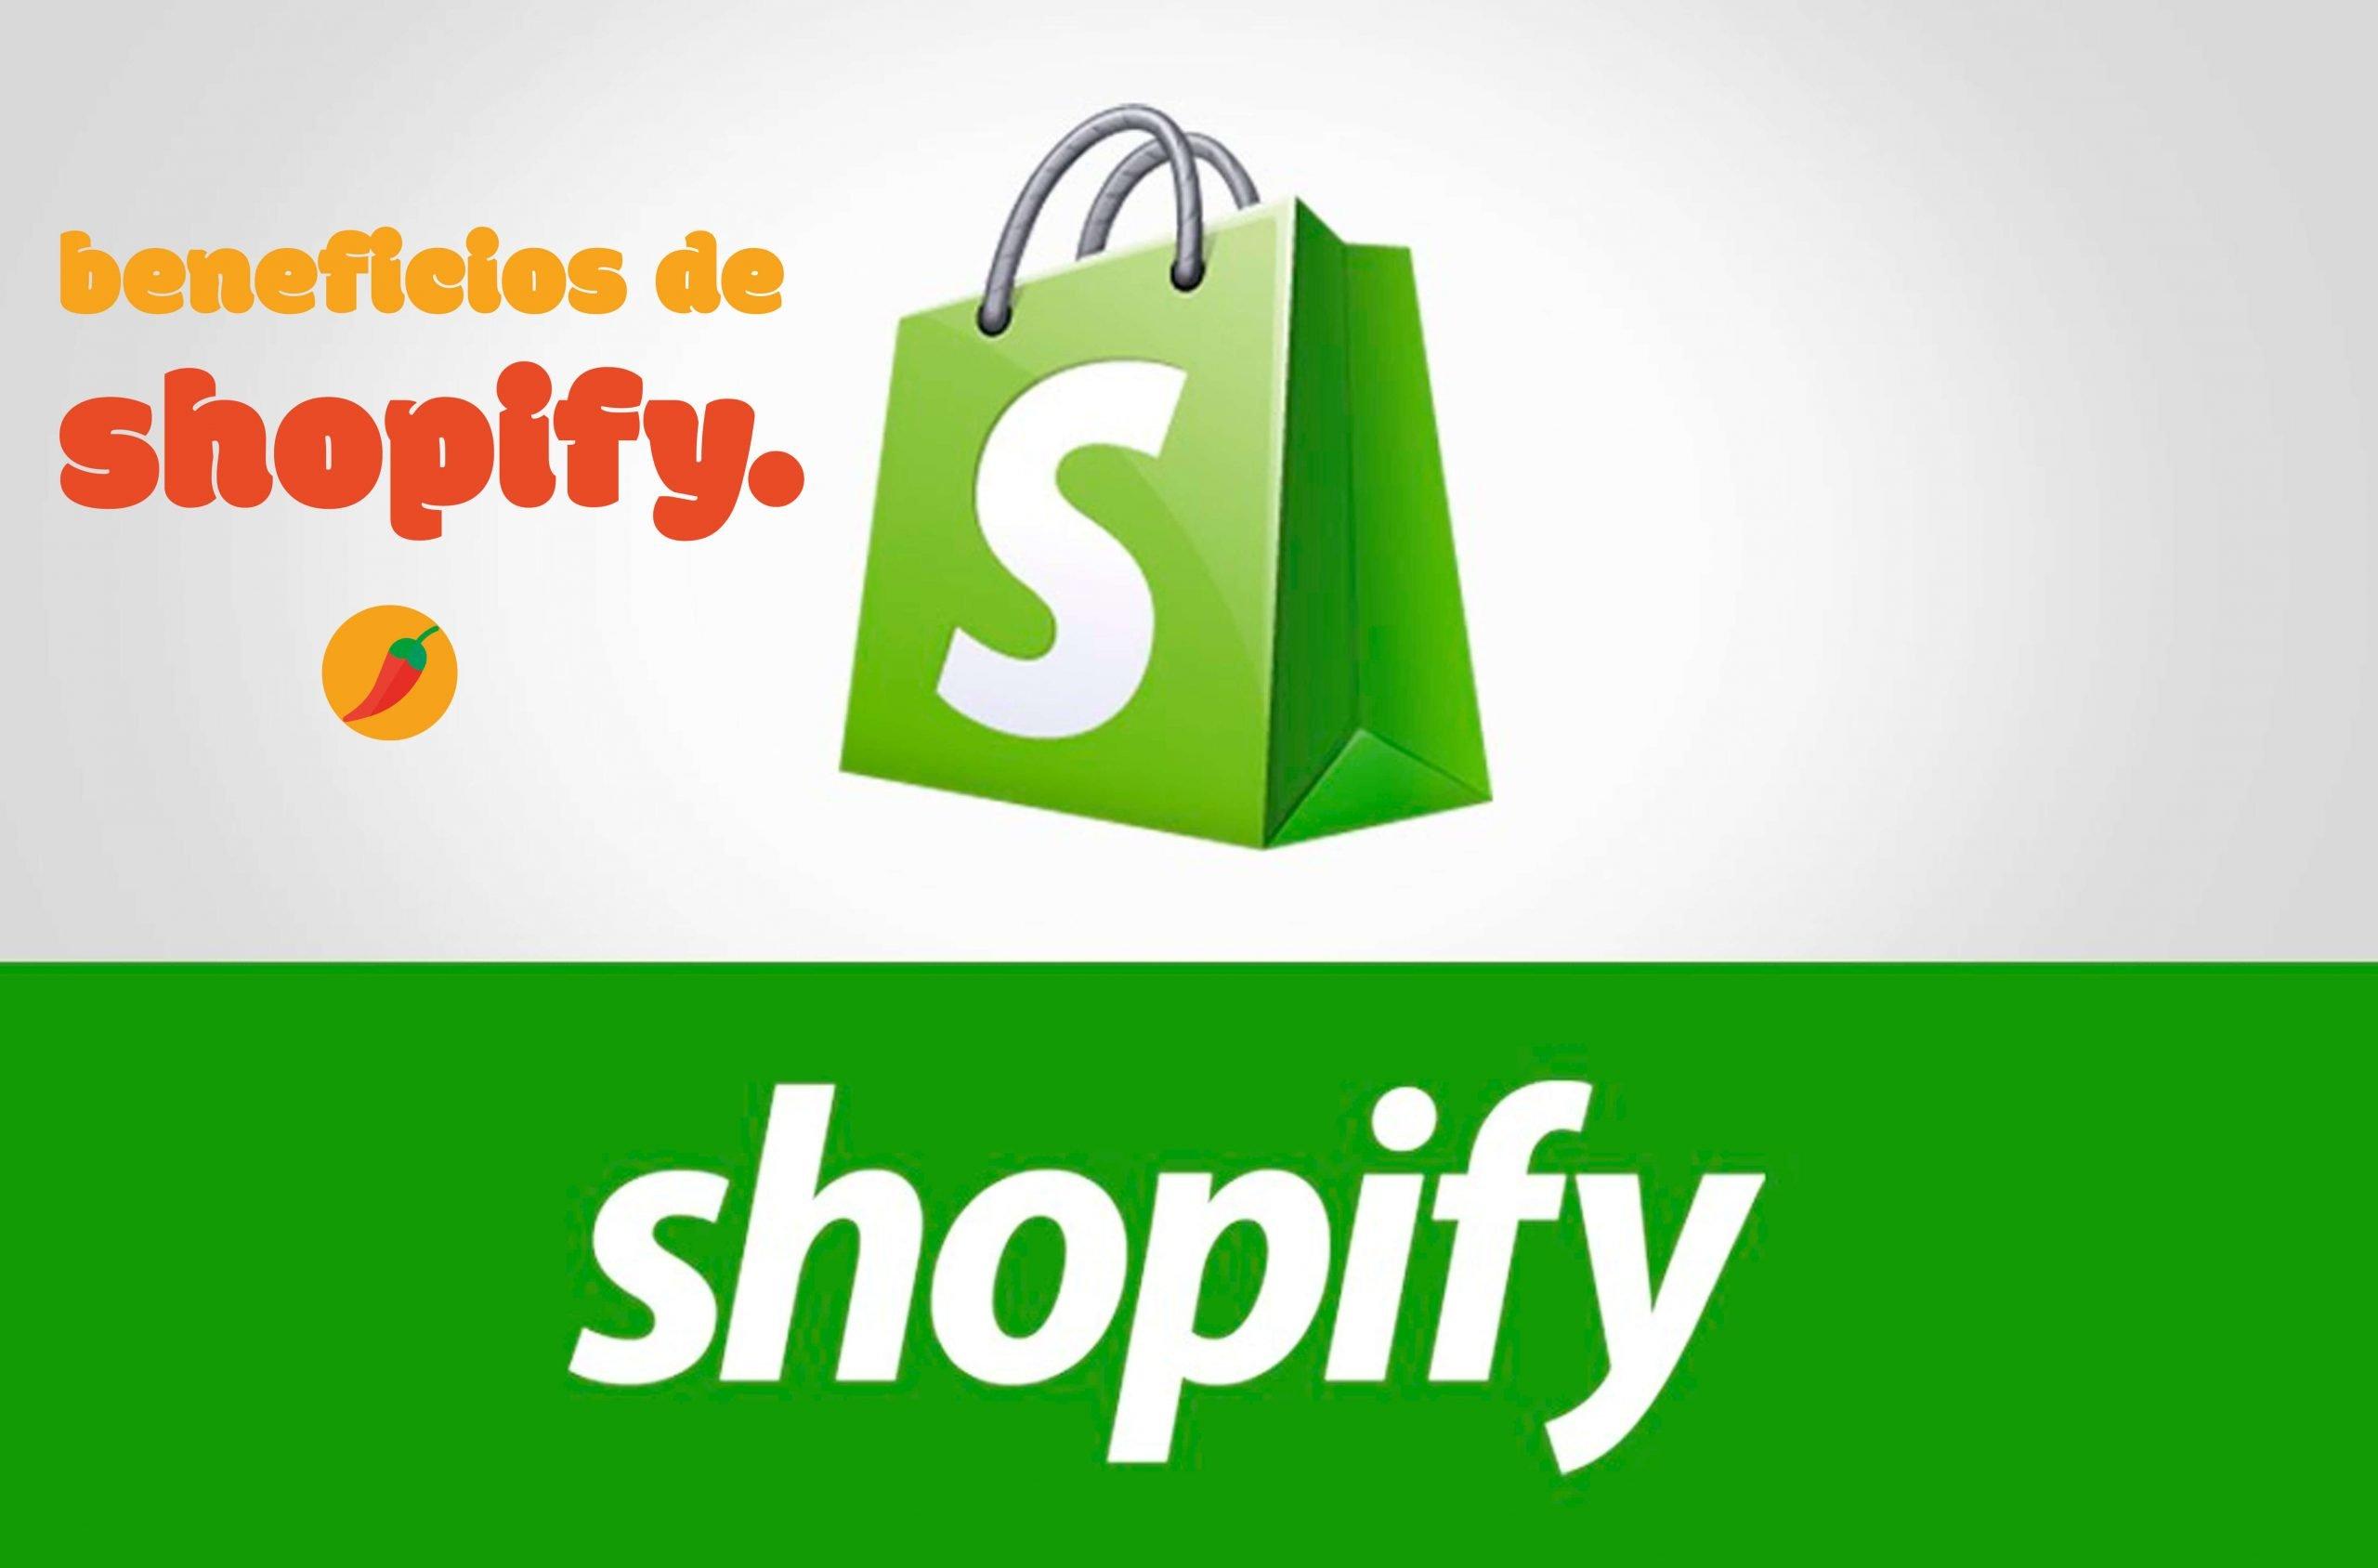 Benificios de Shopify, 10 razones para amarlo - Blog Sweet Chili Agencia Creativa